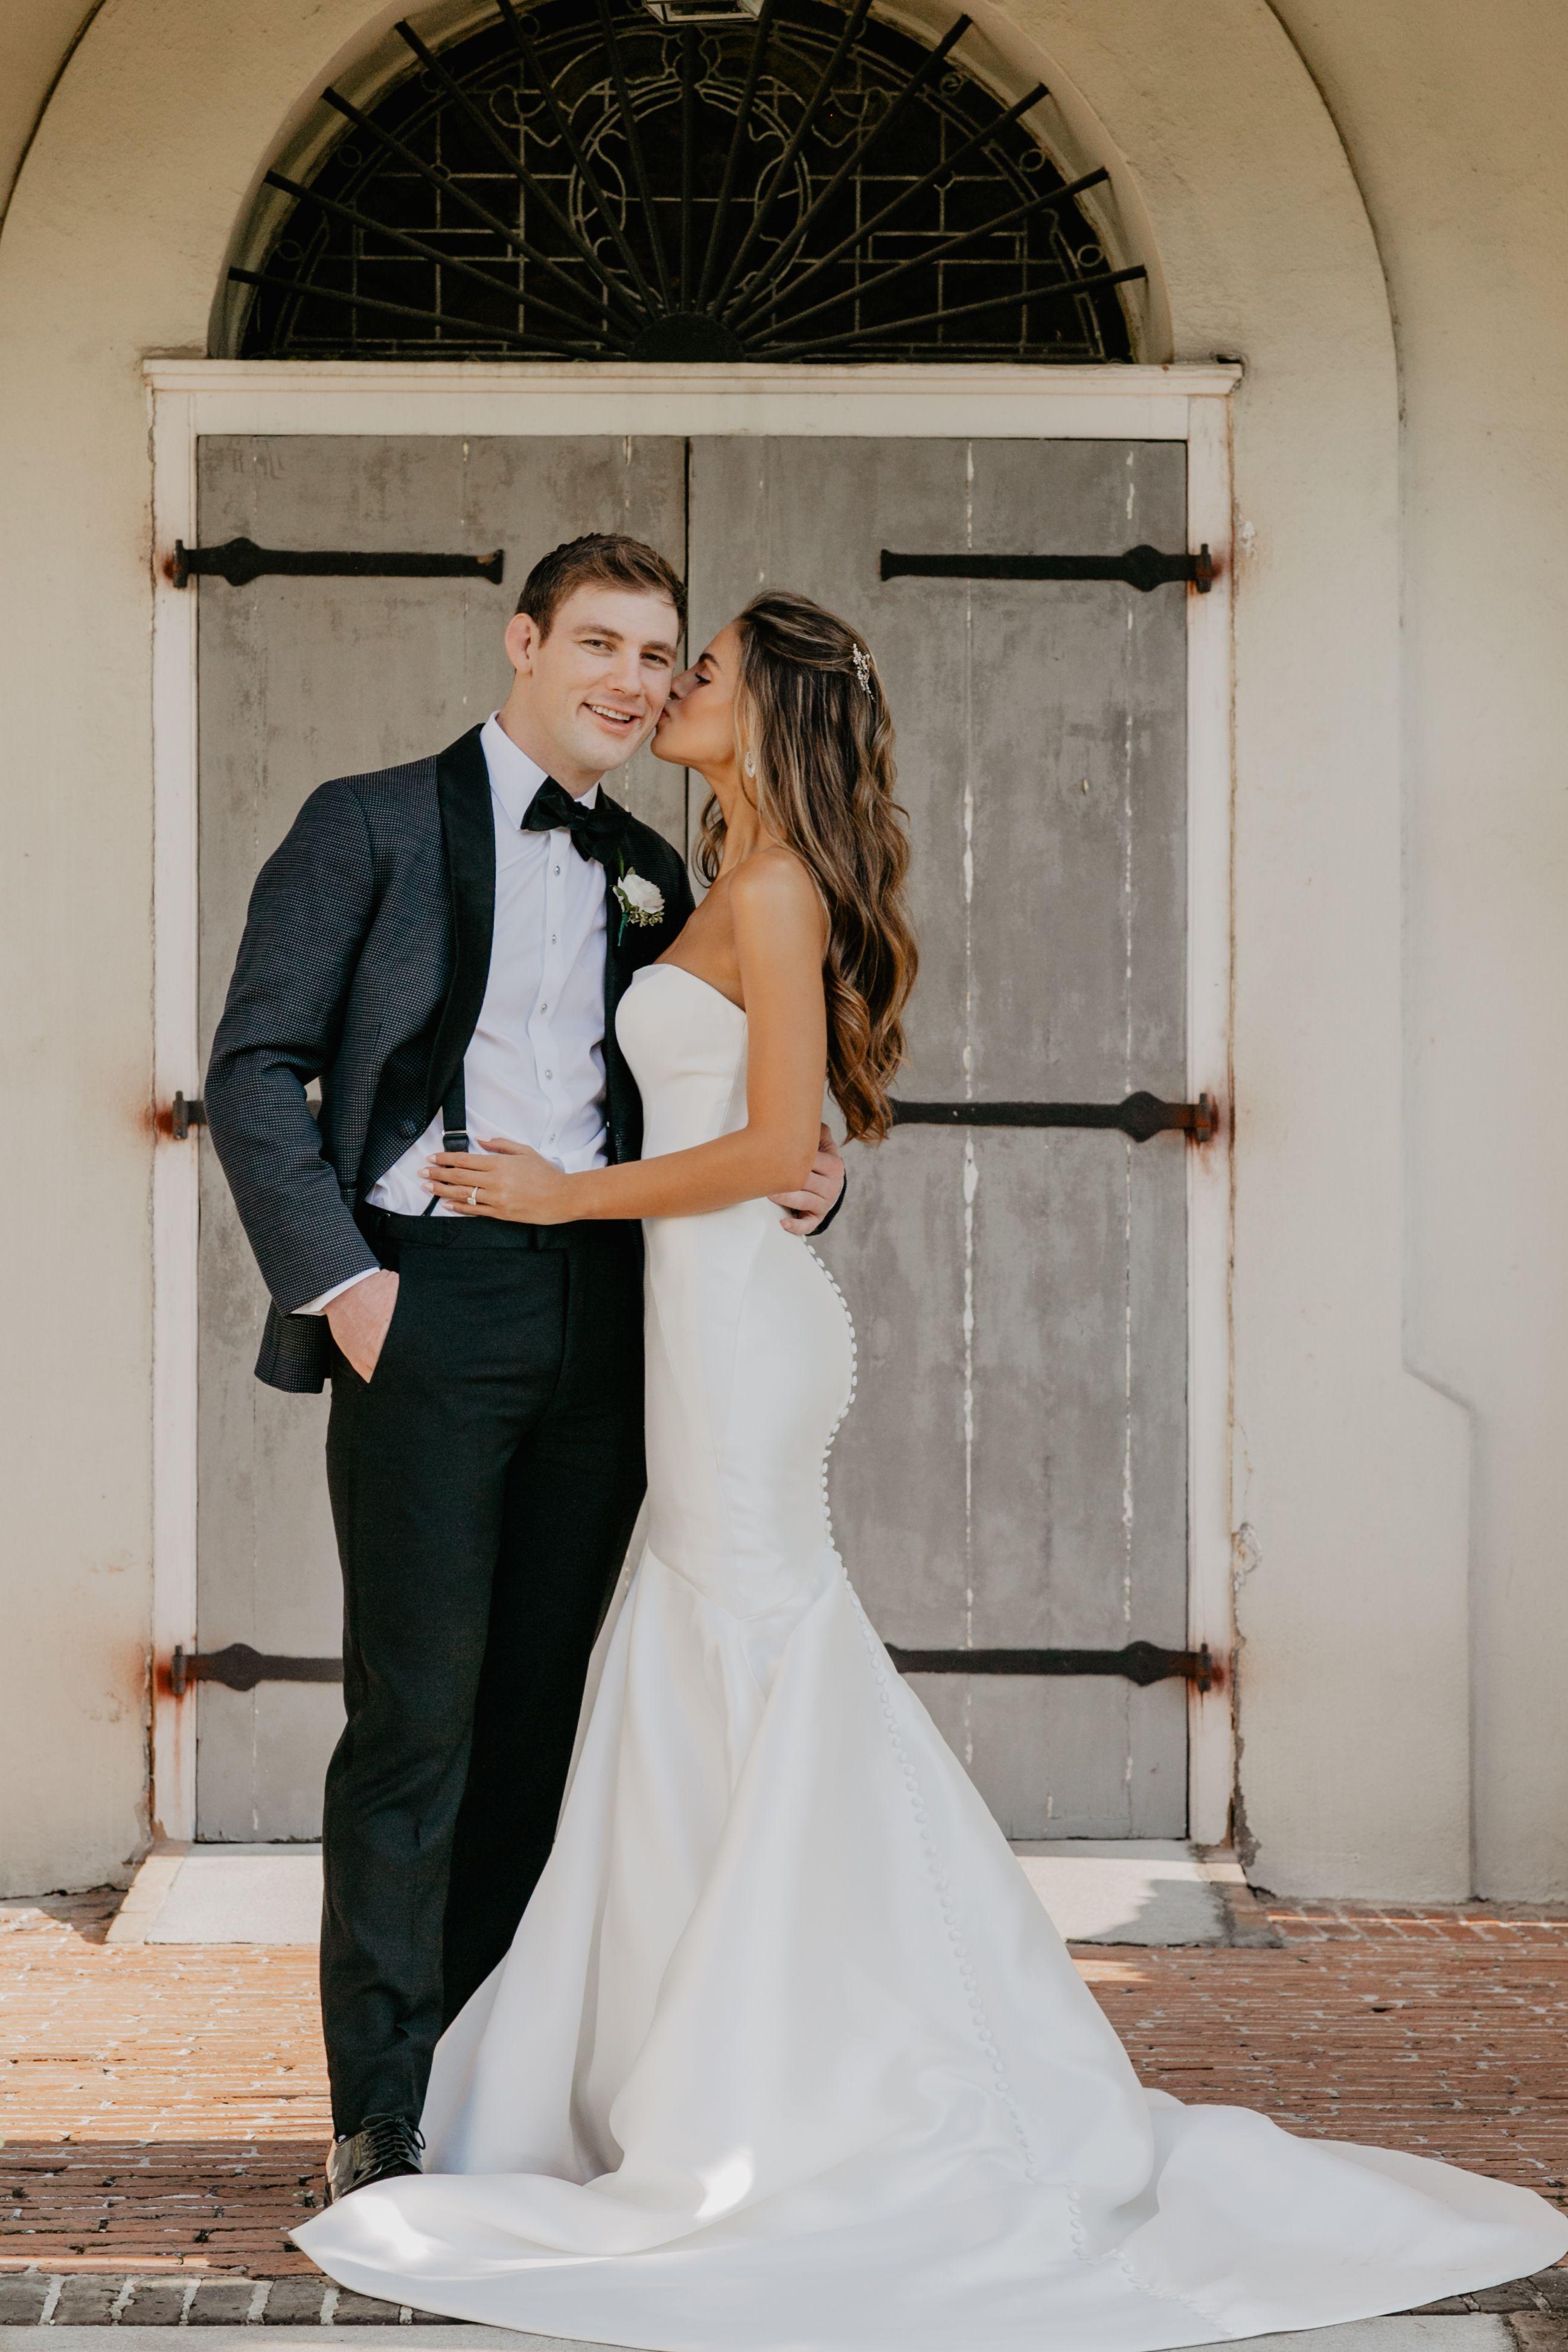 Model Brooks Nader S Romantic Winter Wedding In New Orleans